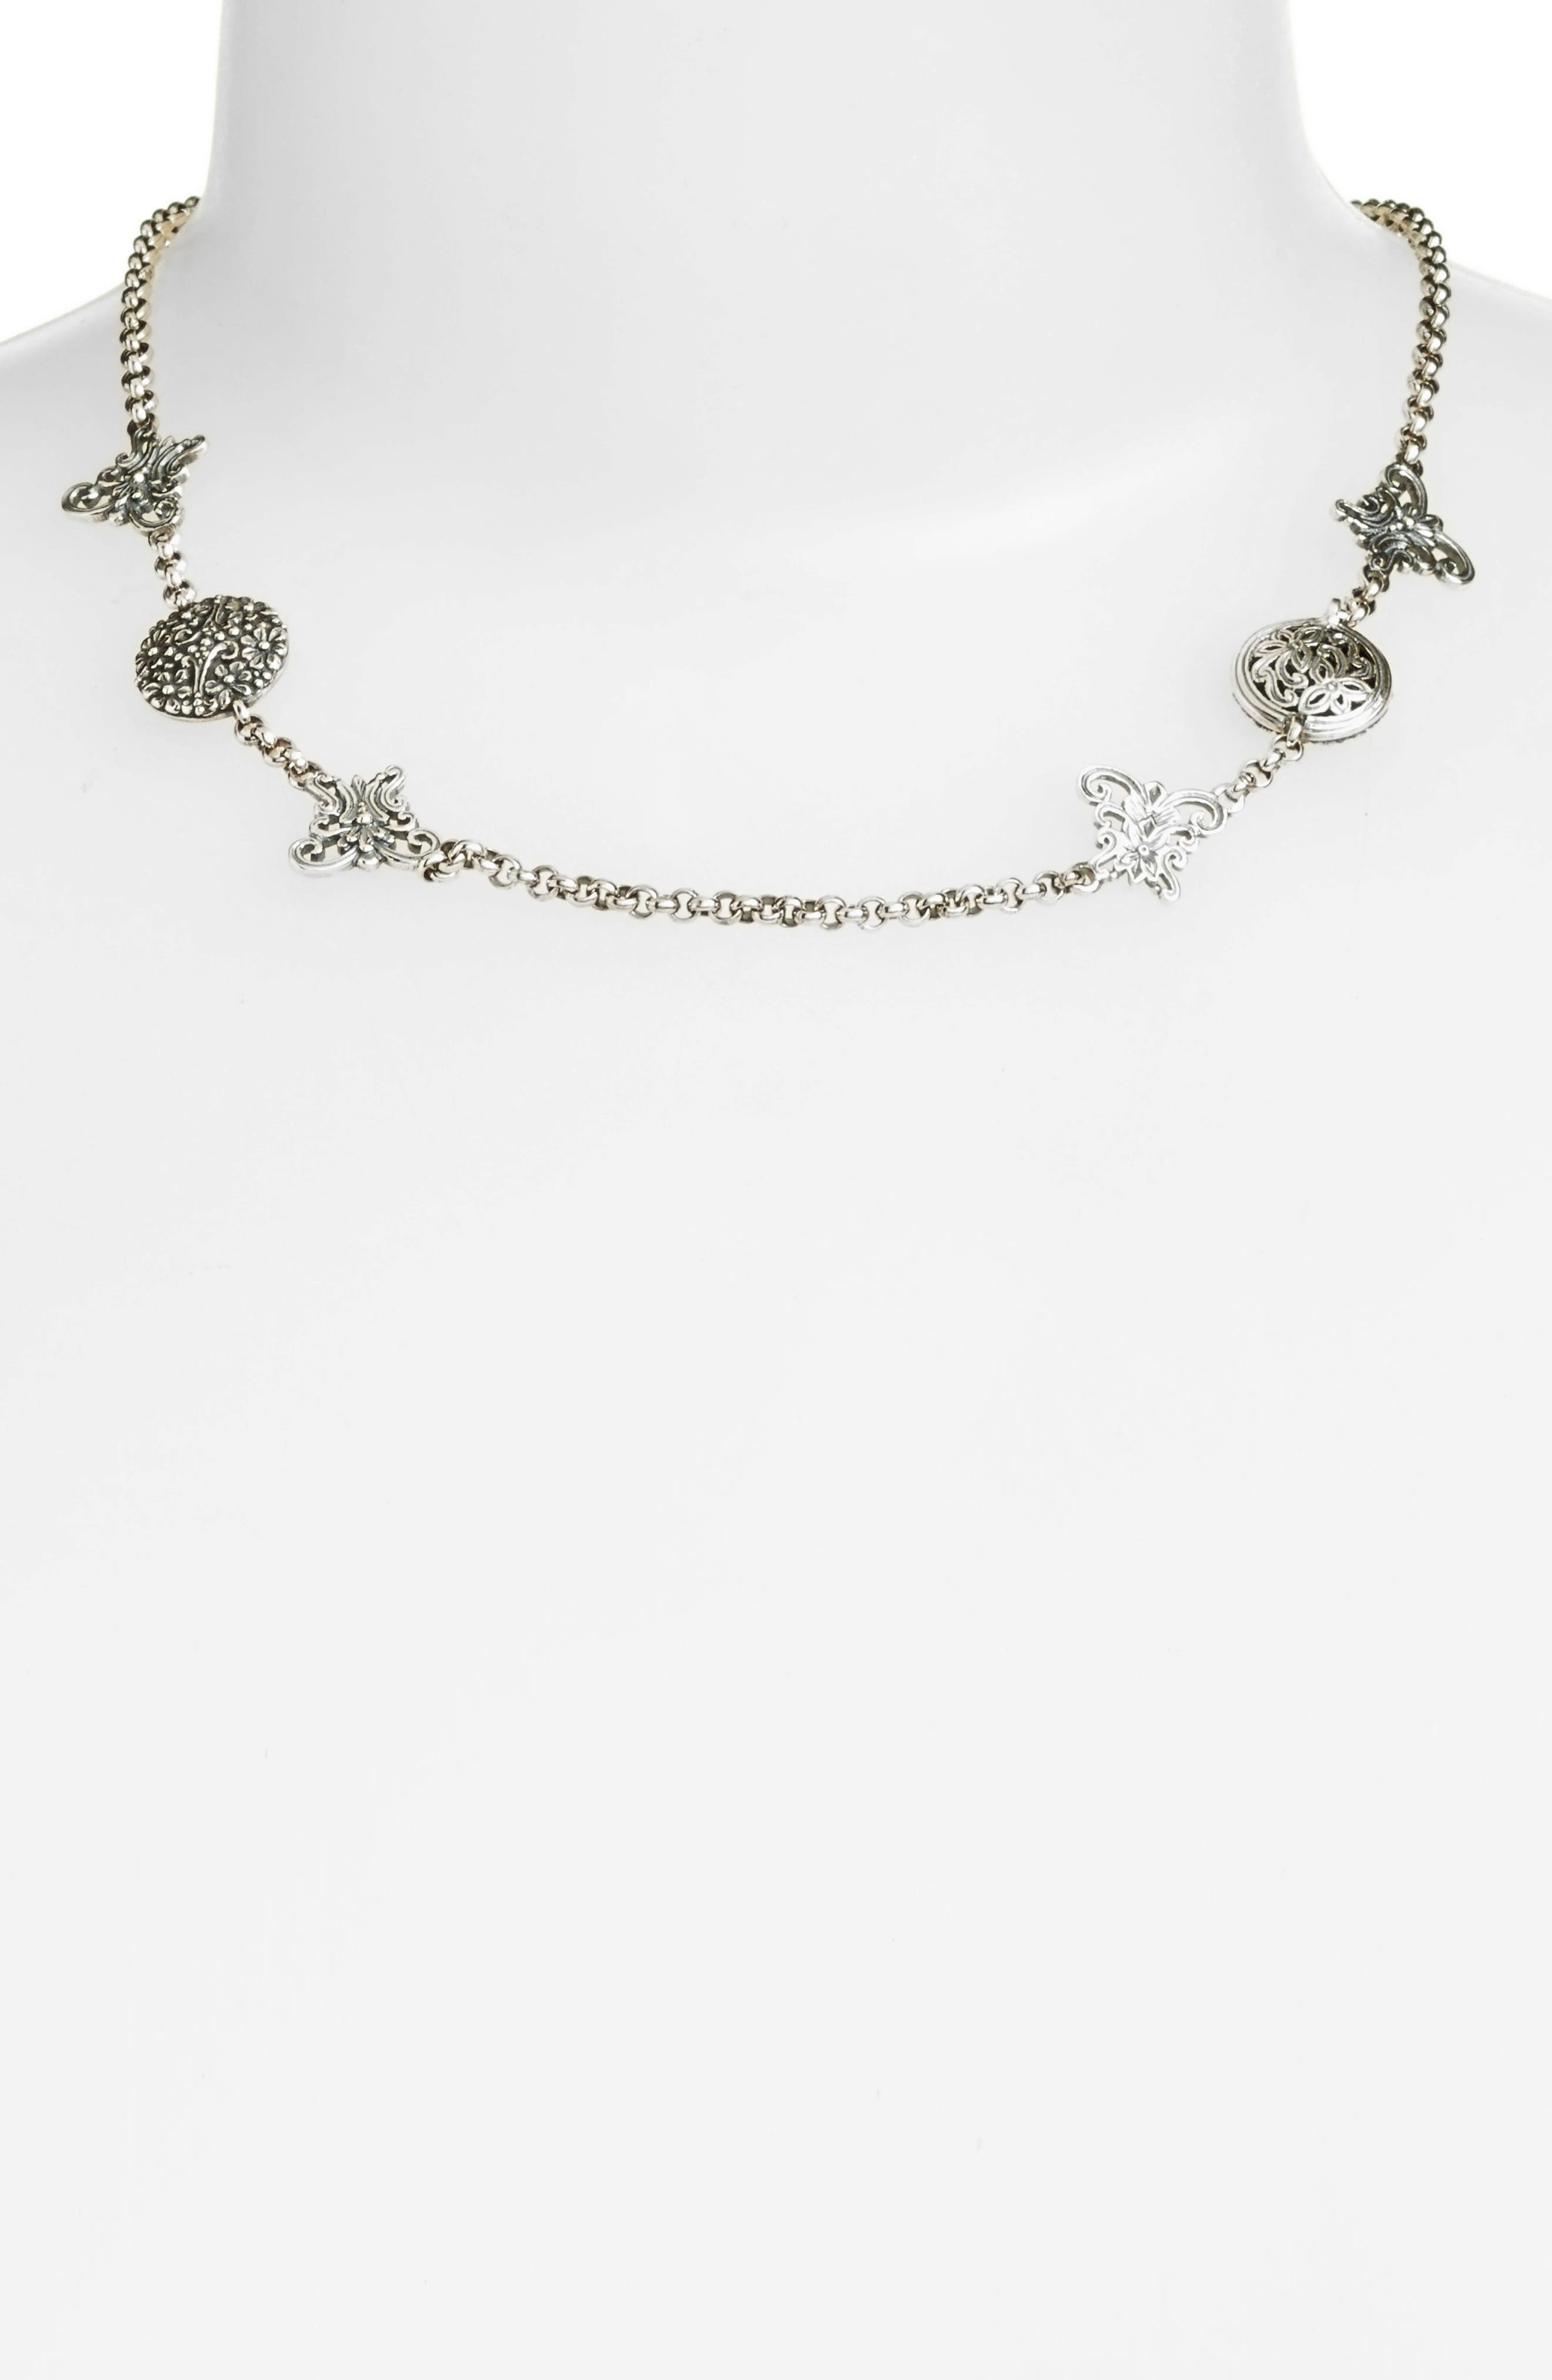 Santorini Butterfly Collar Necklace,                             Main thumbnail 1, color,                             Silver/ Hematite